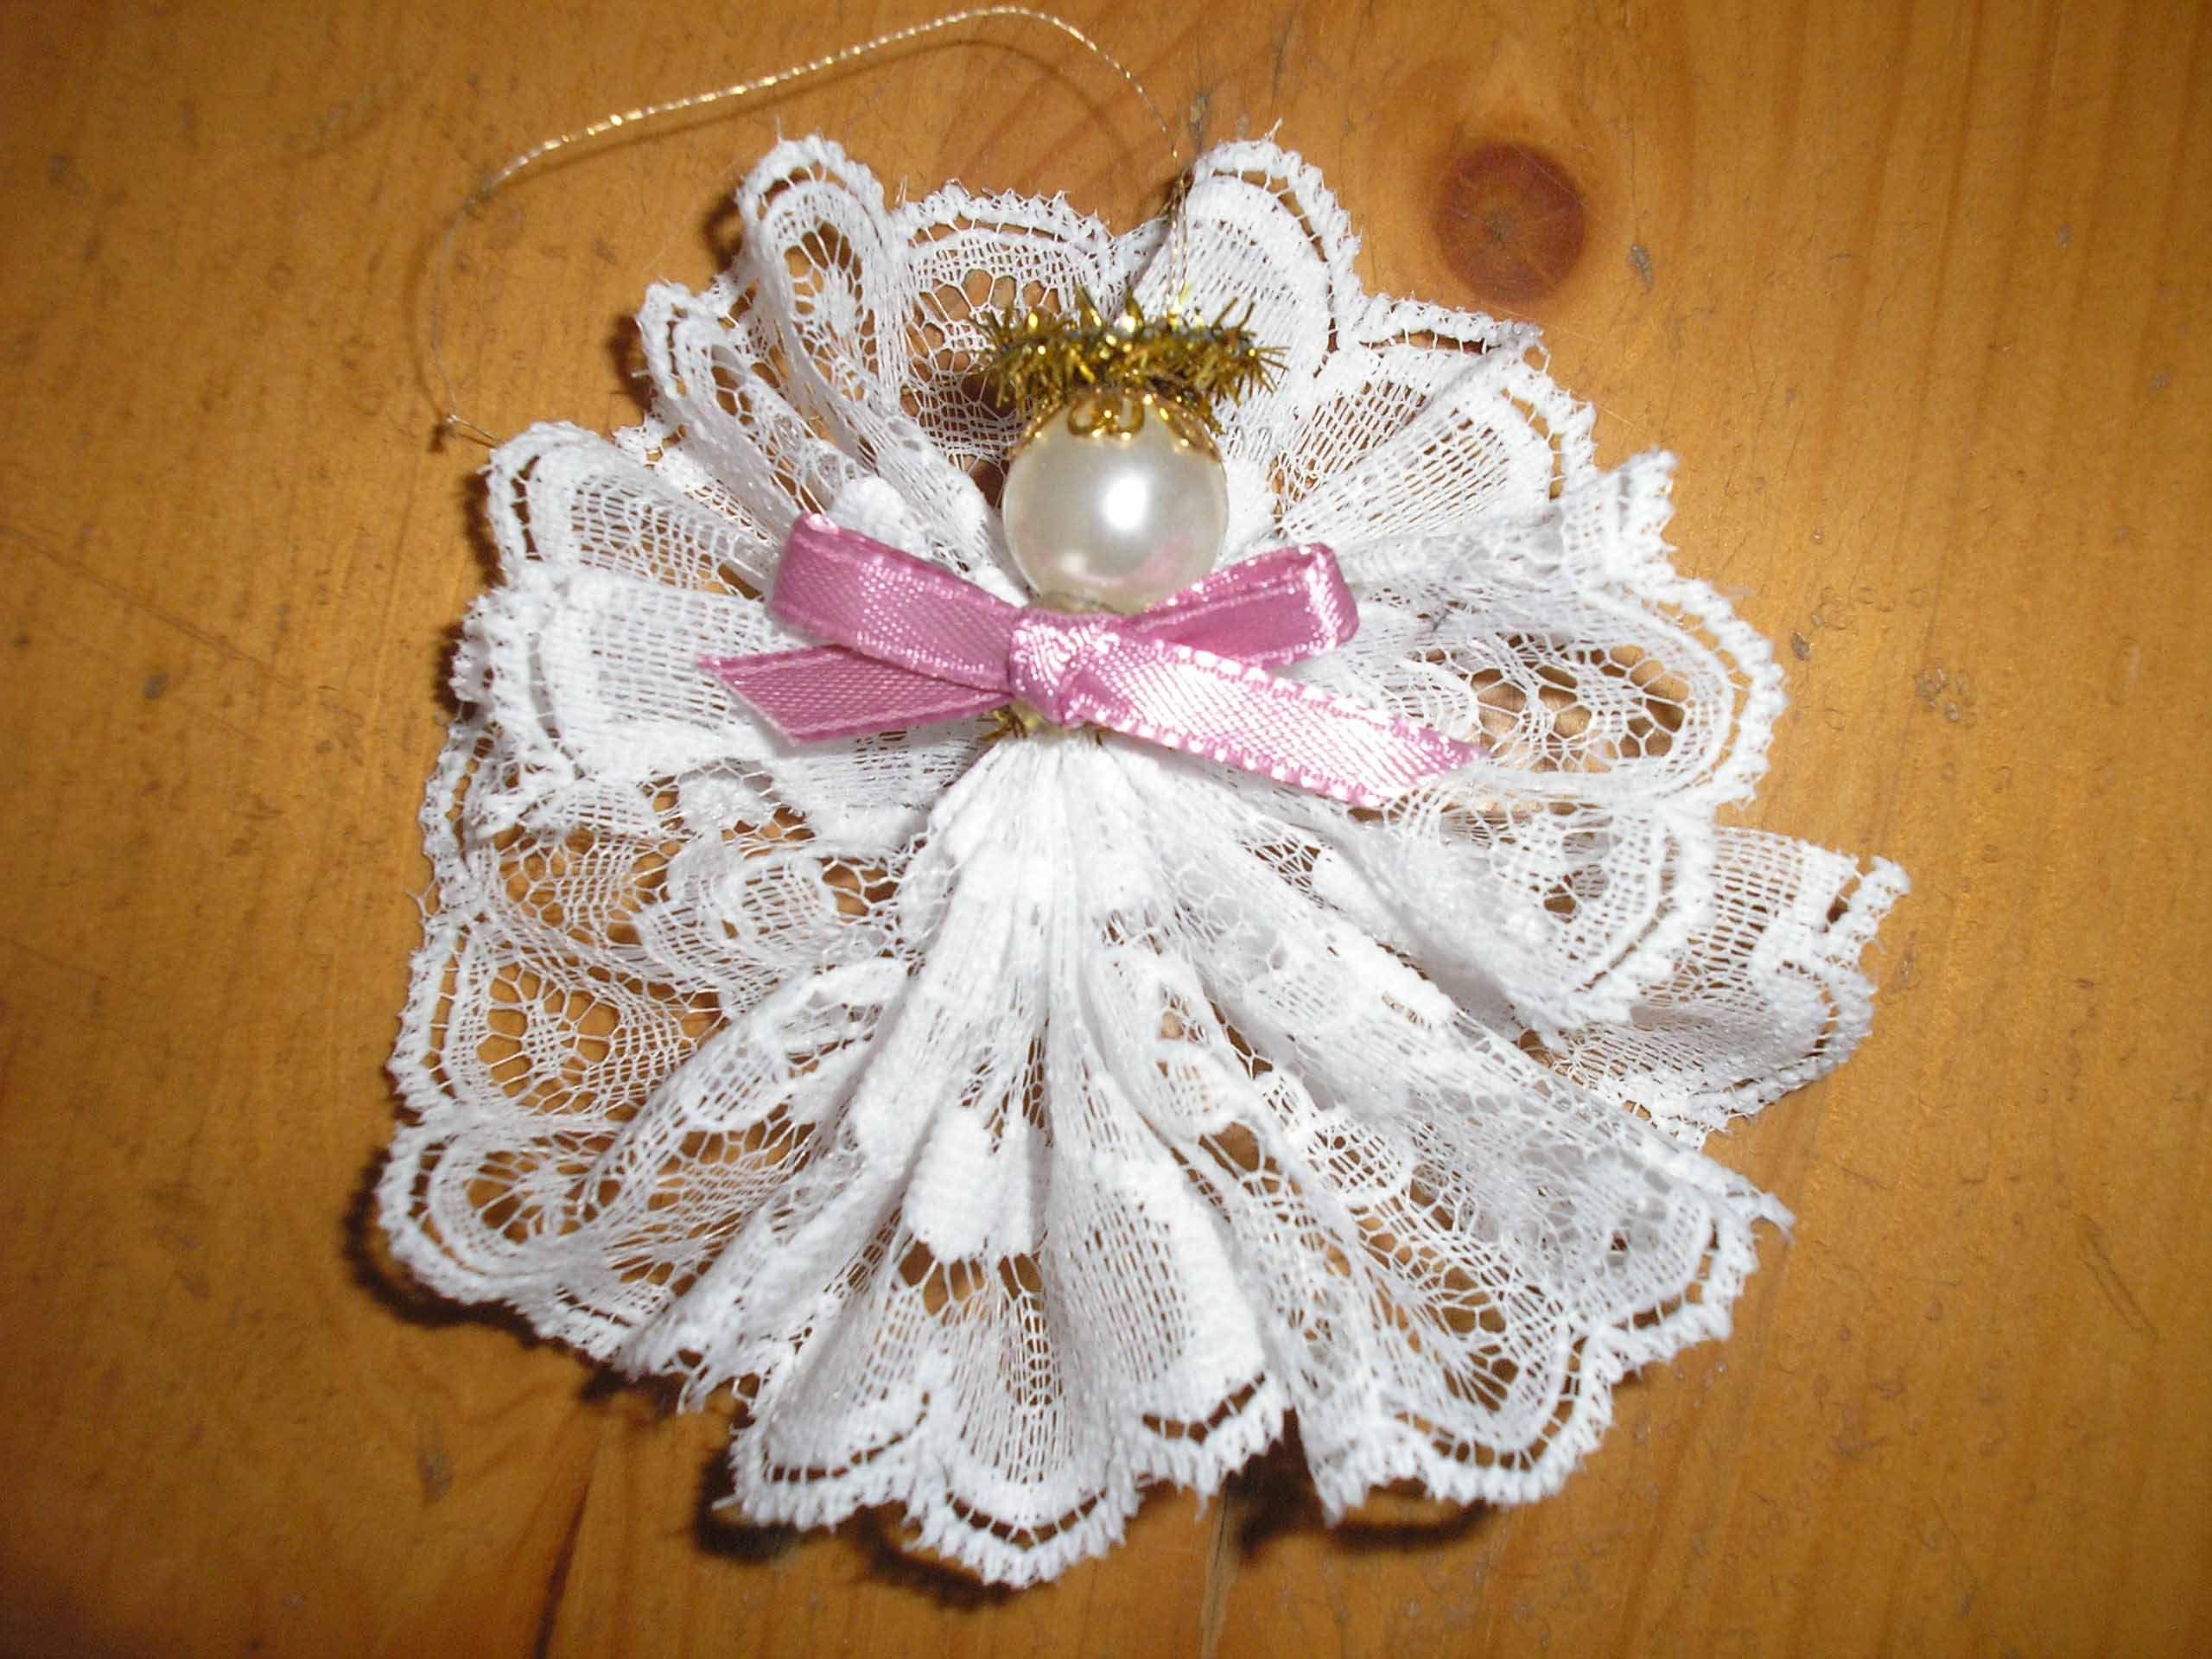 ornament craft ideas site - photo #47